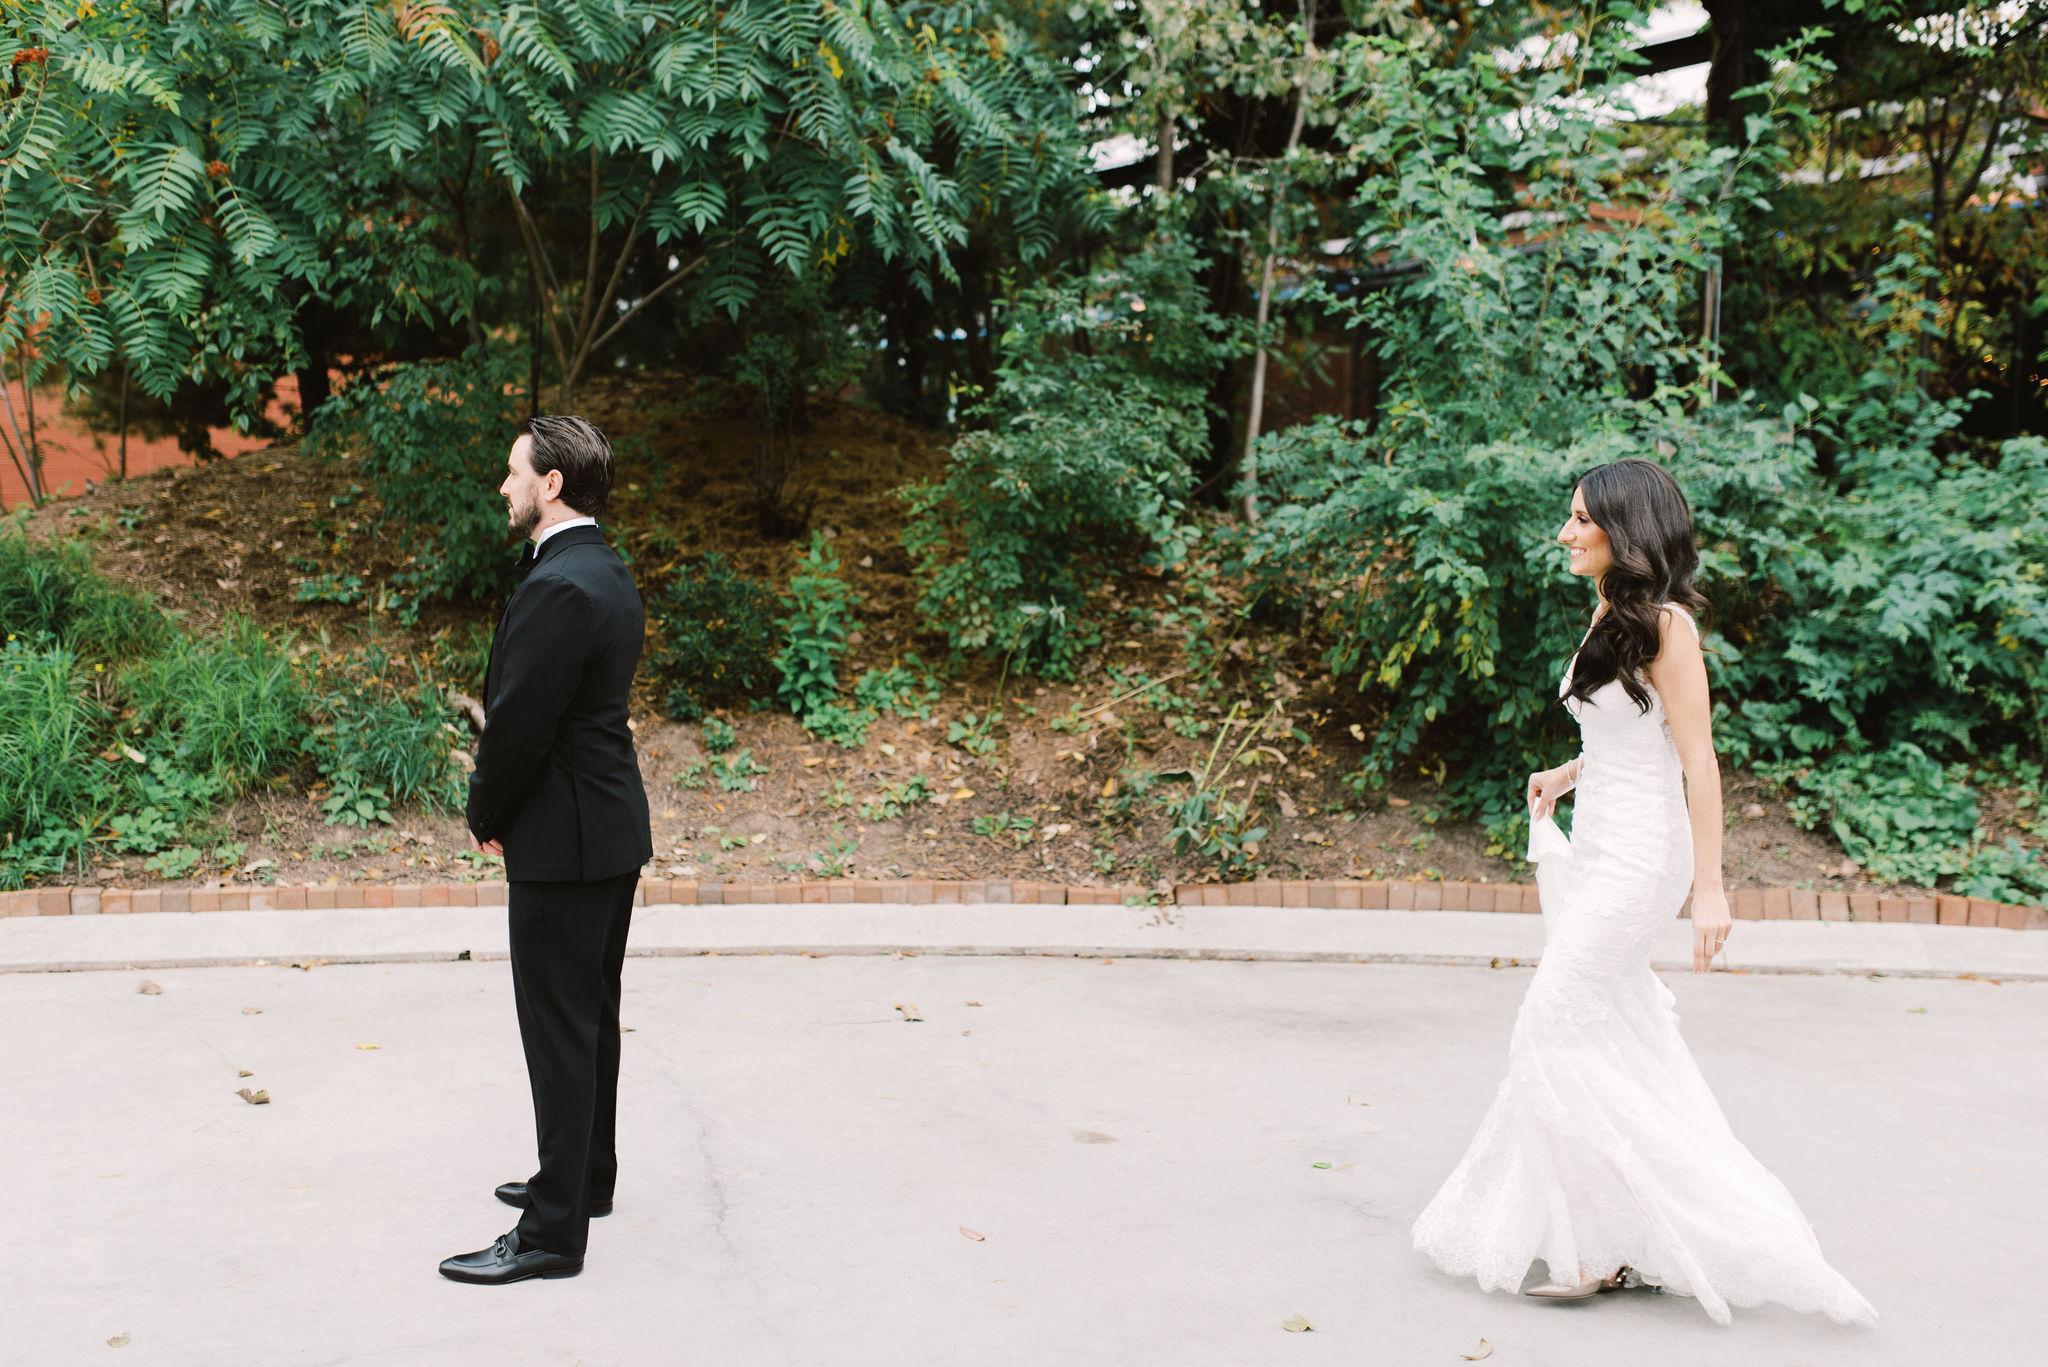 0343-artiese-evergreen-brickworks-wedding-ashleycraig-26591.jpg